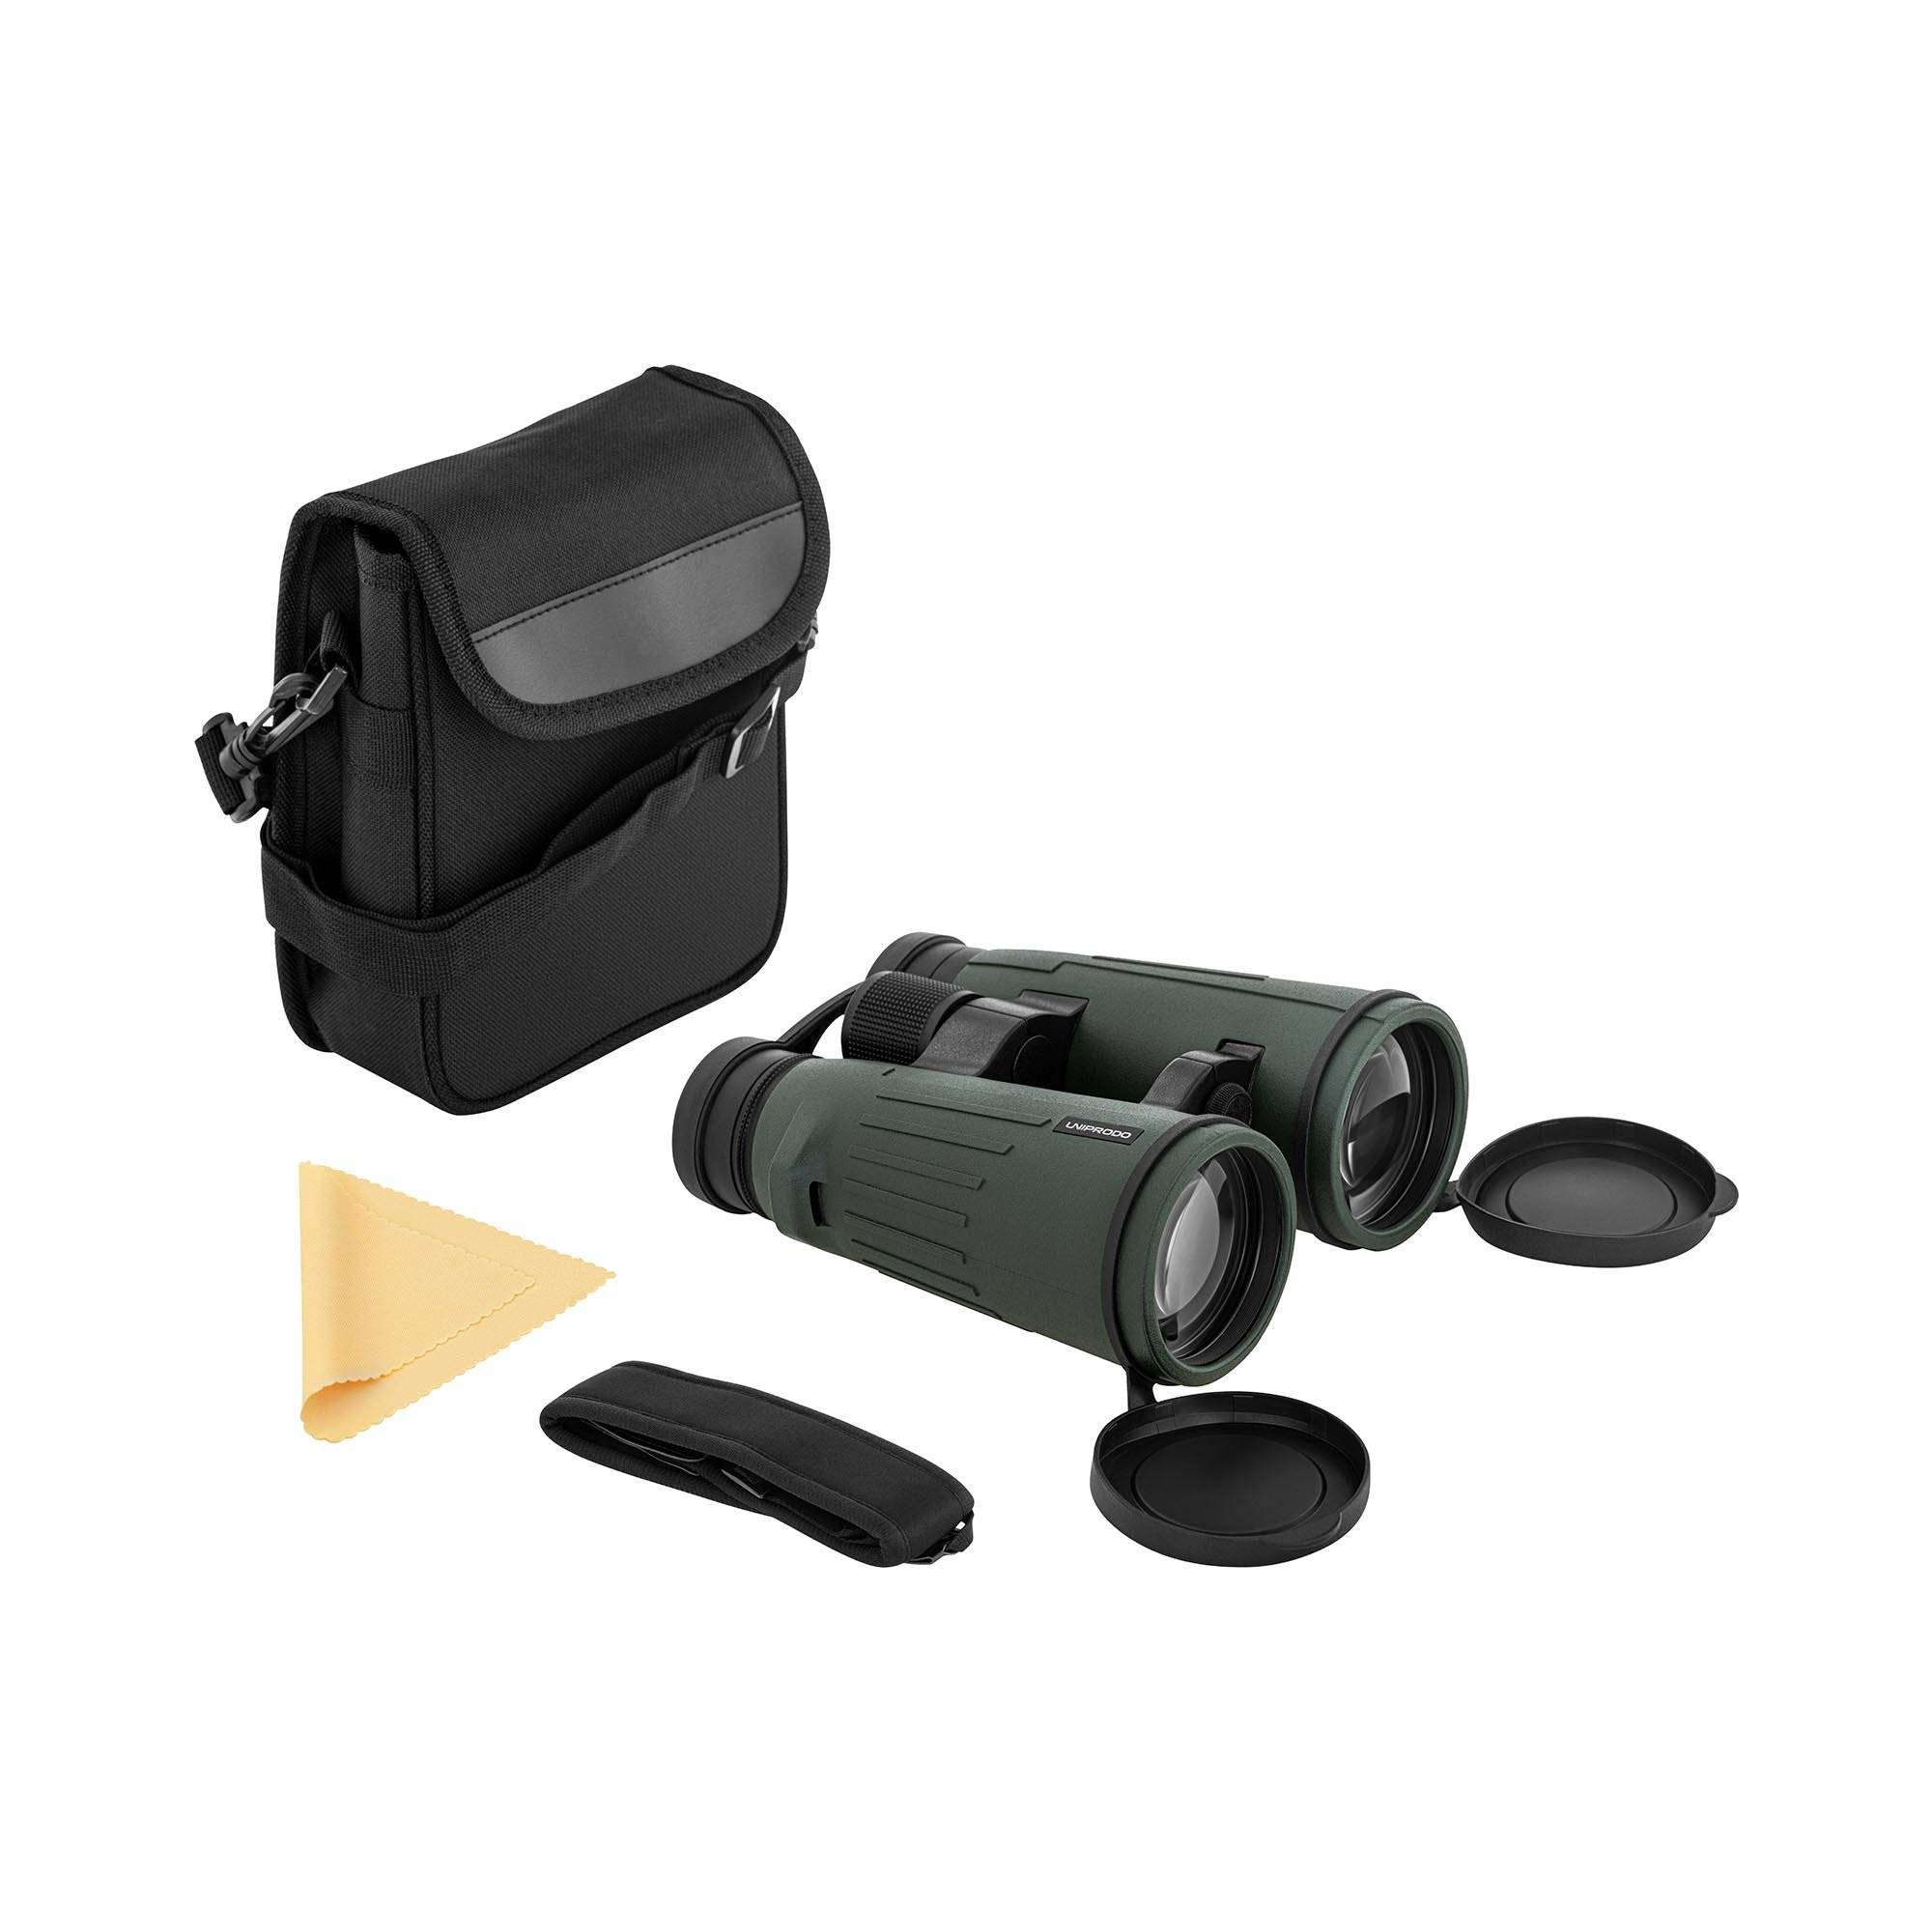 Uniprodo Binoculars - 8x56 - 6.4° - 112 m/1,000 m - BAK-4 - dielectric coating - ED glass UNI_BINOCULAR_09